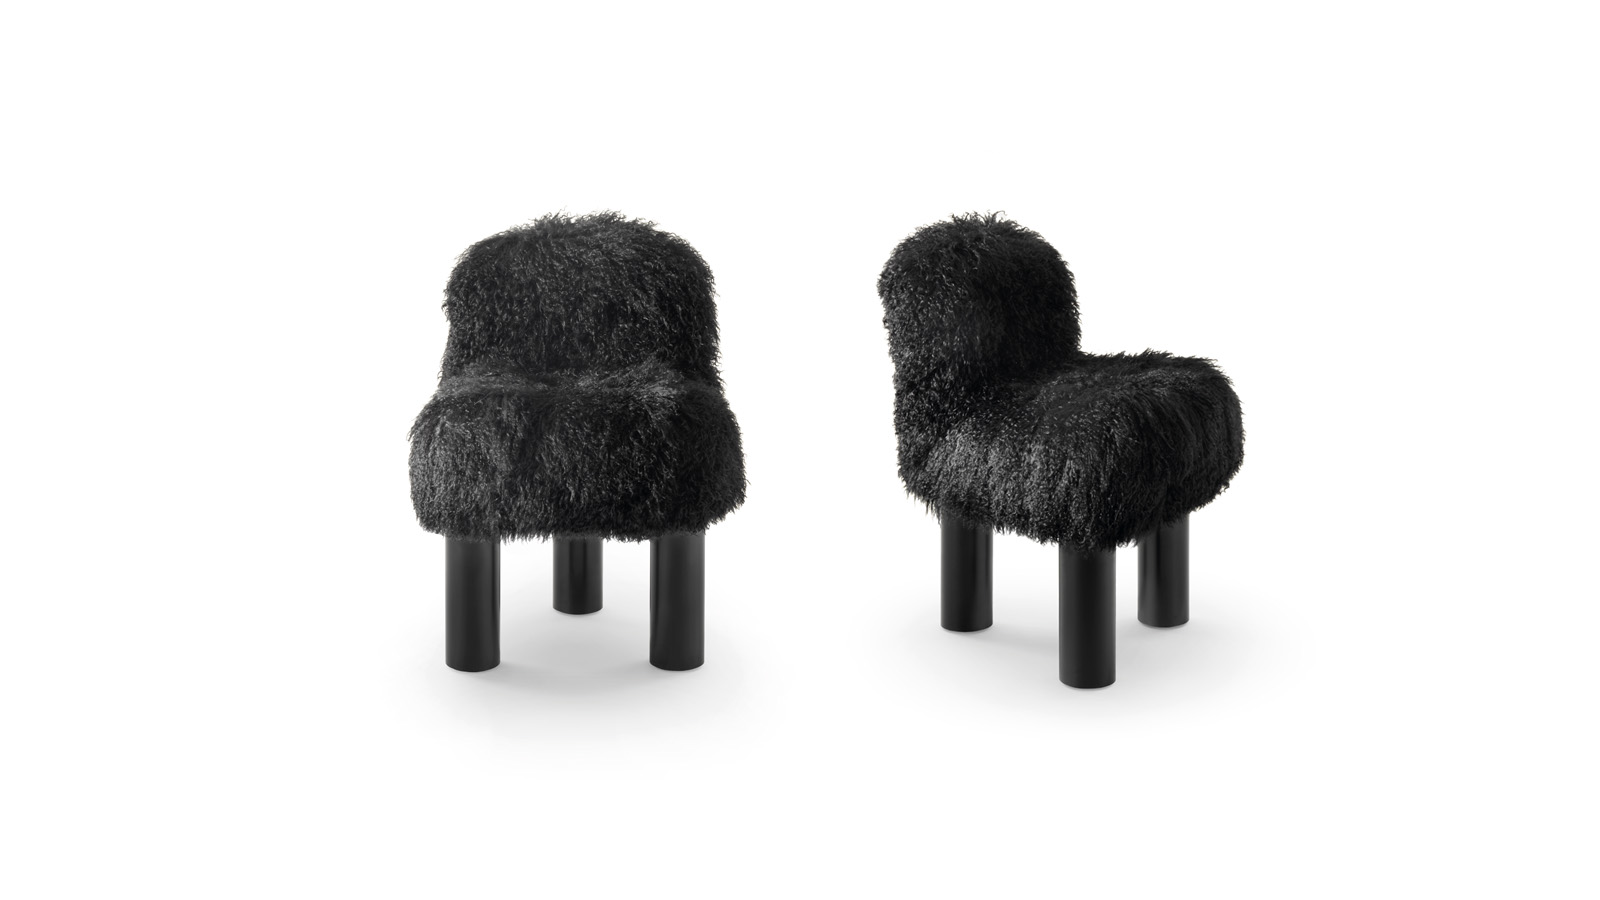 TinnappleMetz-arflex-botolo-Chair-12